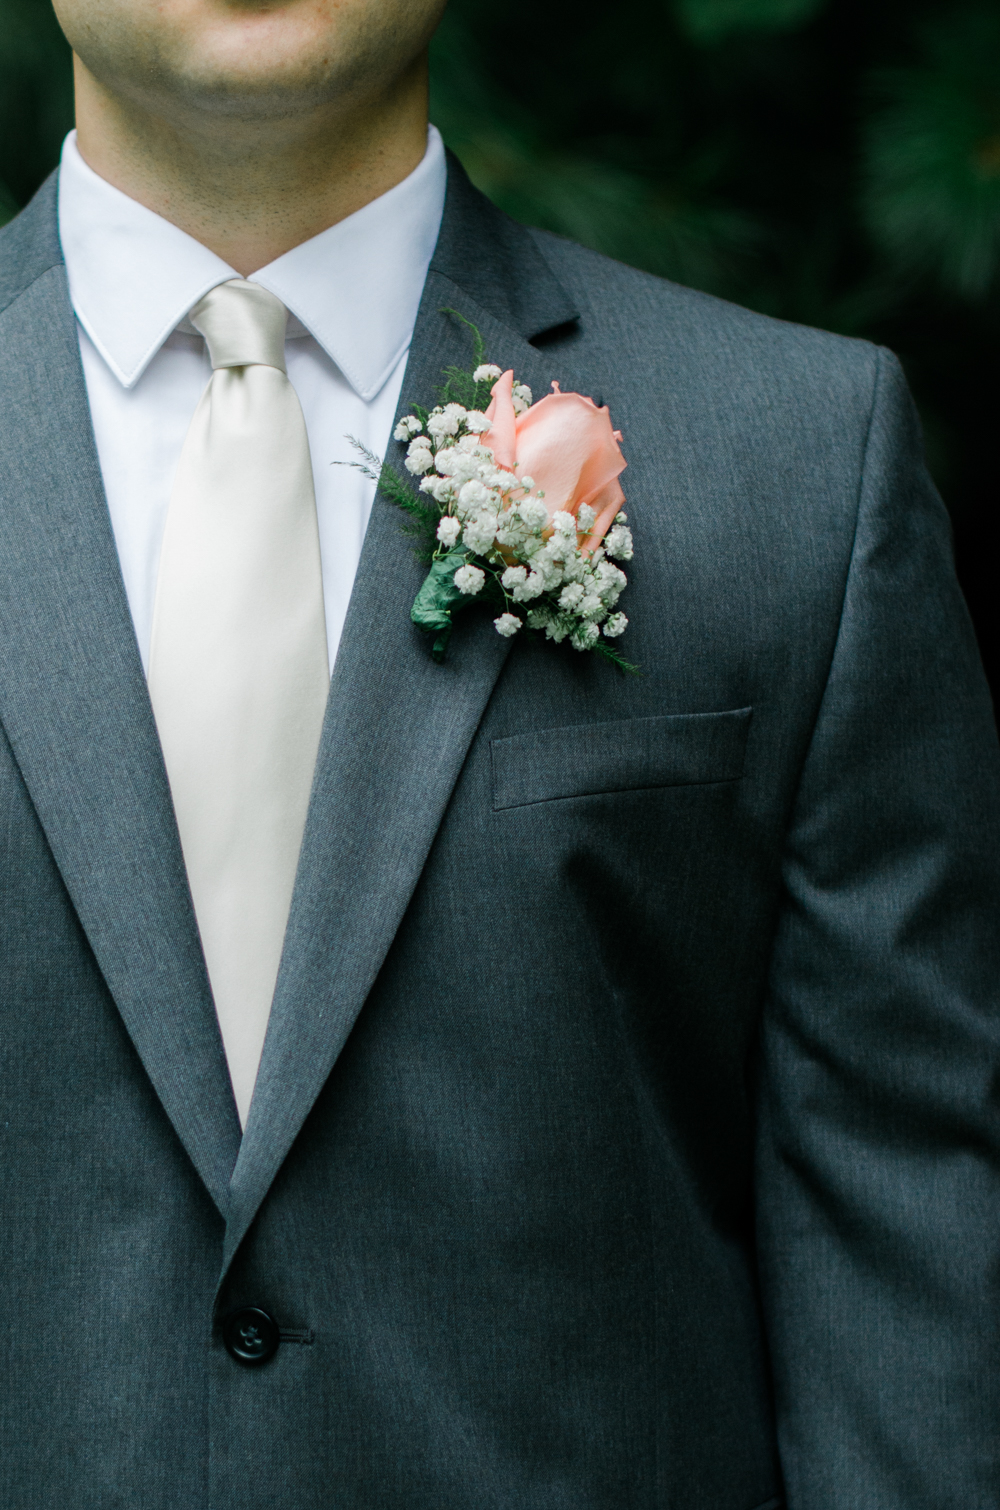 Mendenhall_Inn_Wedding_Pennsylvania_Rebecca_Watkins_Photography_2014-017.jpg